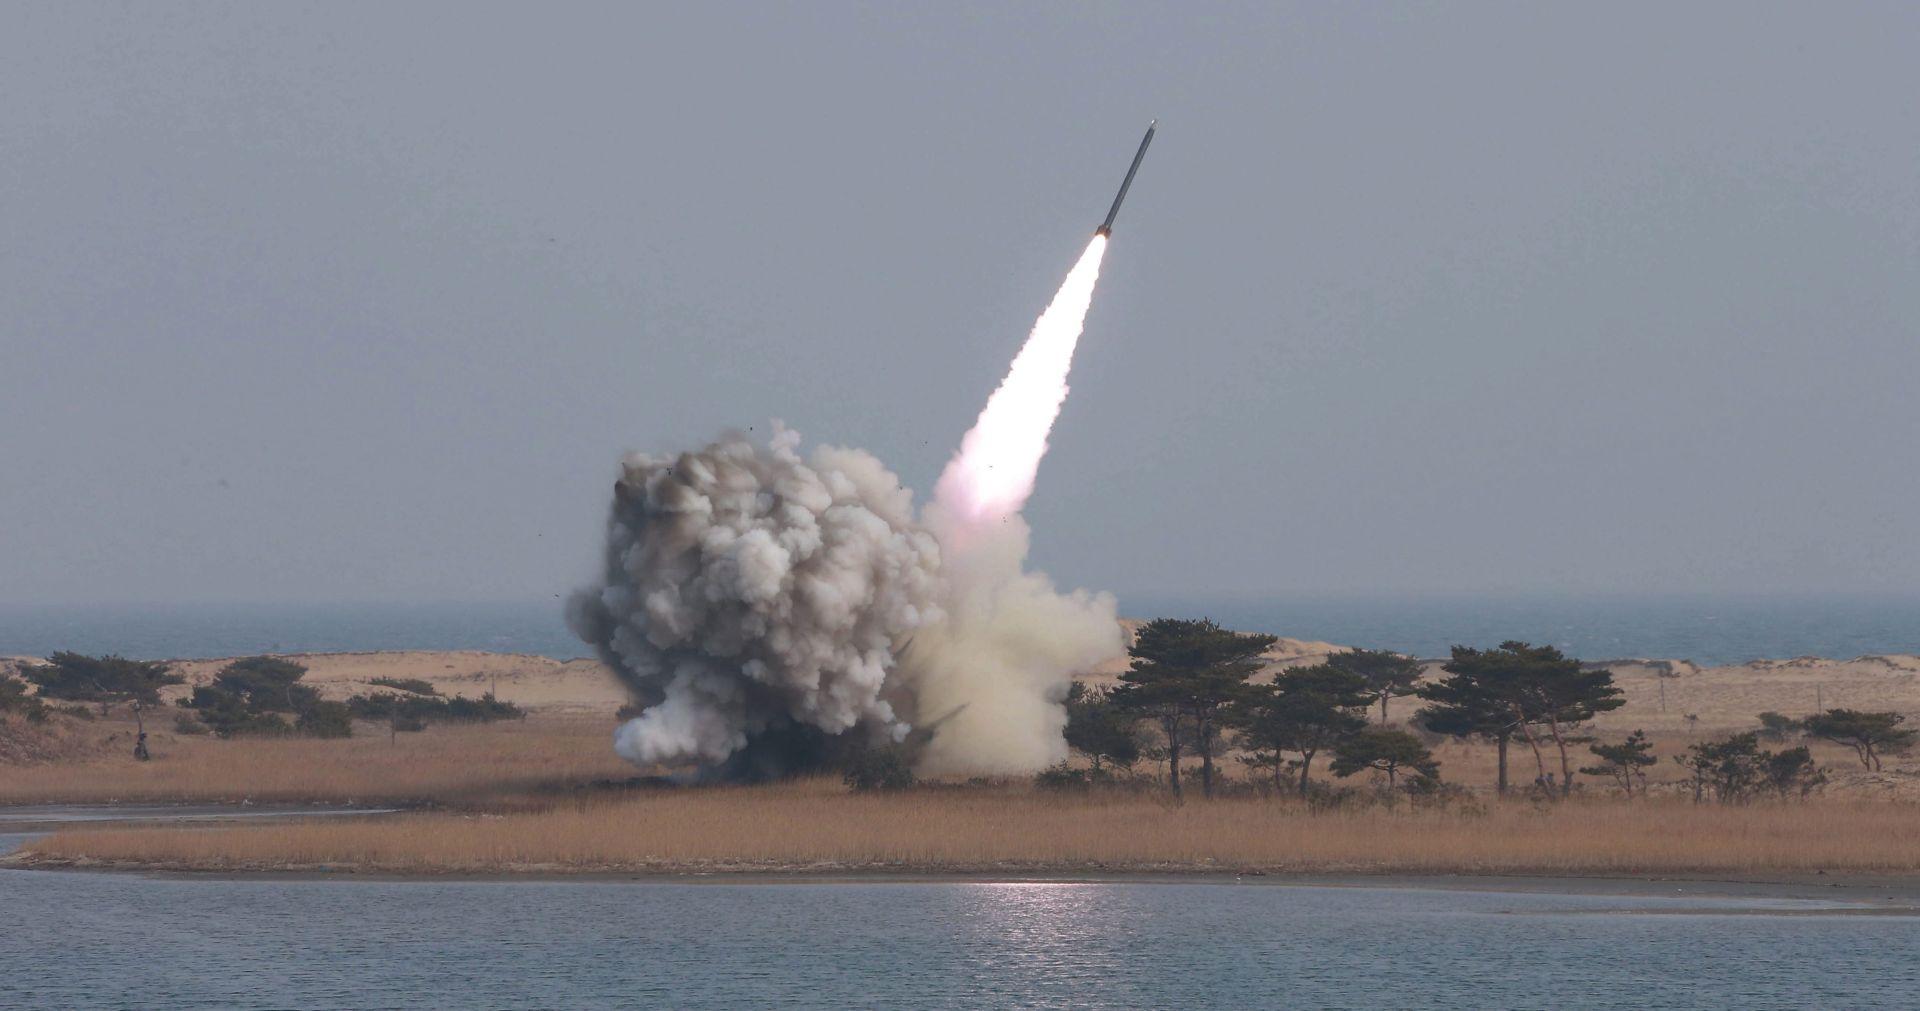 JUŽNA KOREJA ZABRINUTA: Sj.Koreja lansirala balističku raketu s podmornice